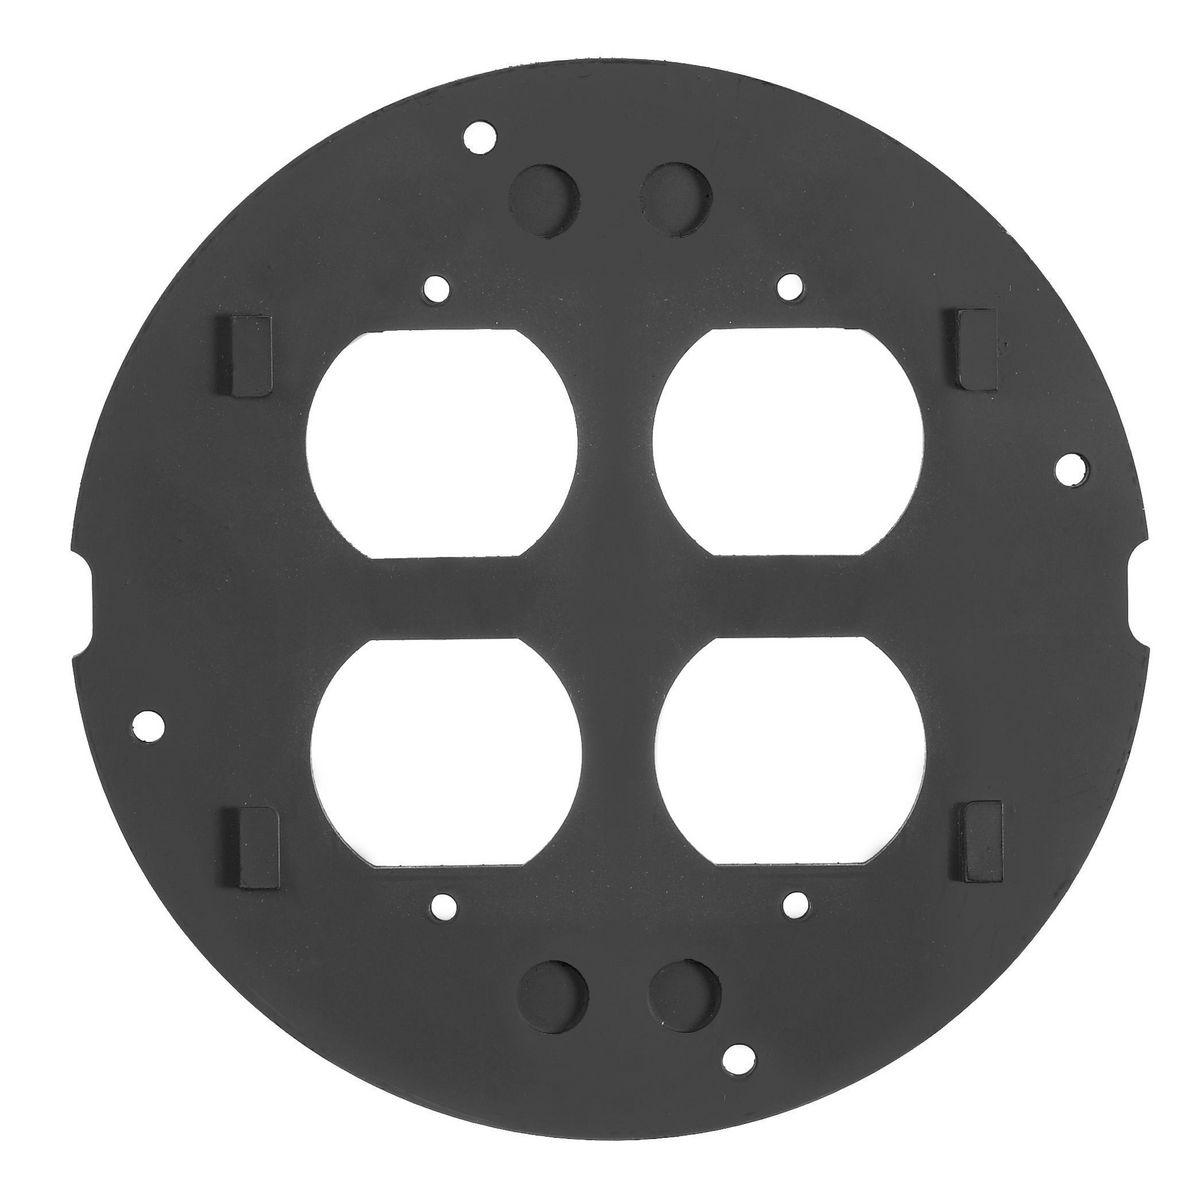 Hubbell S1SPDU Duplex/Duplex Concrete Floor Box Fire Rated Poke-Through Subplate